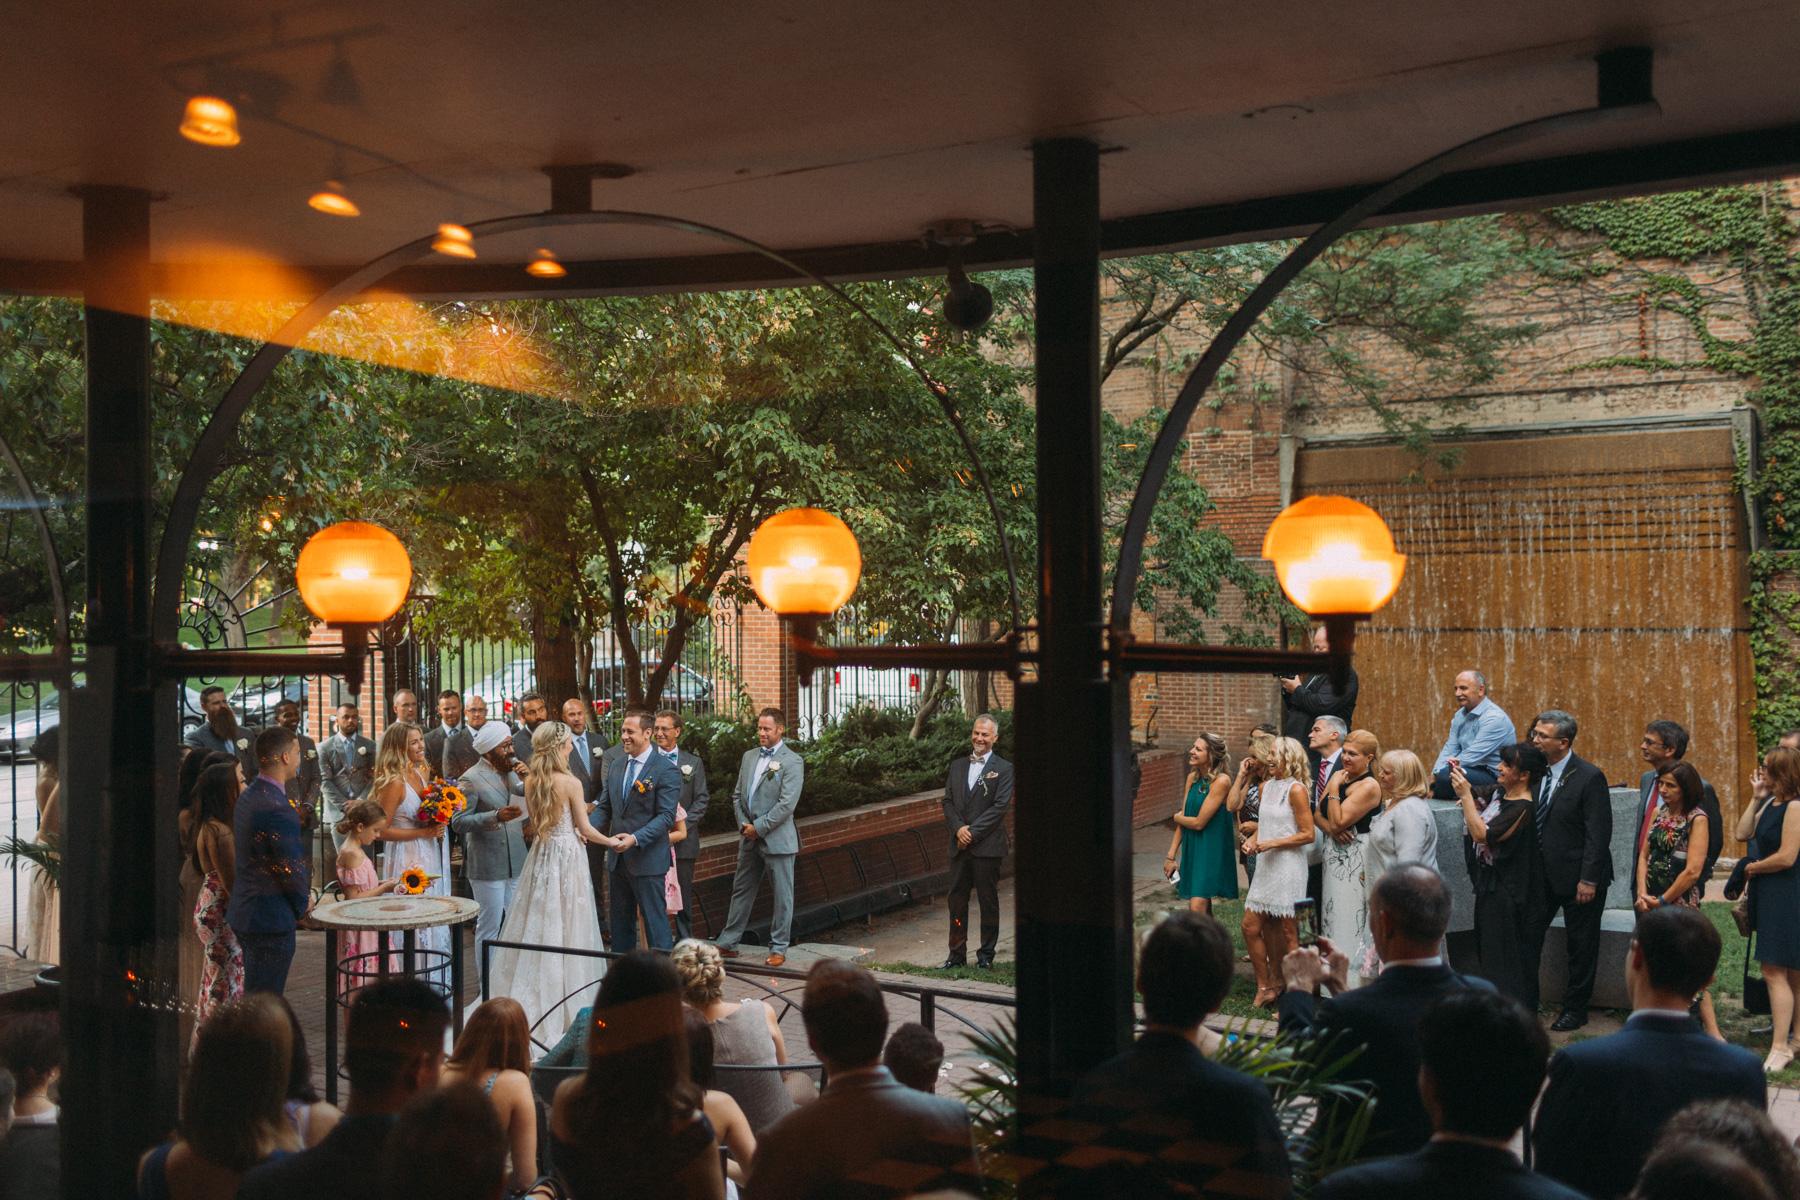 La-Maquette-wedding-by-Toronto-modern-wedding-photographer-Sam-Wong_28.jpg